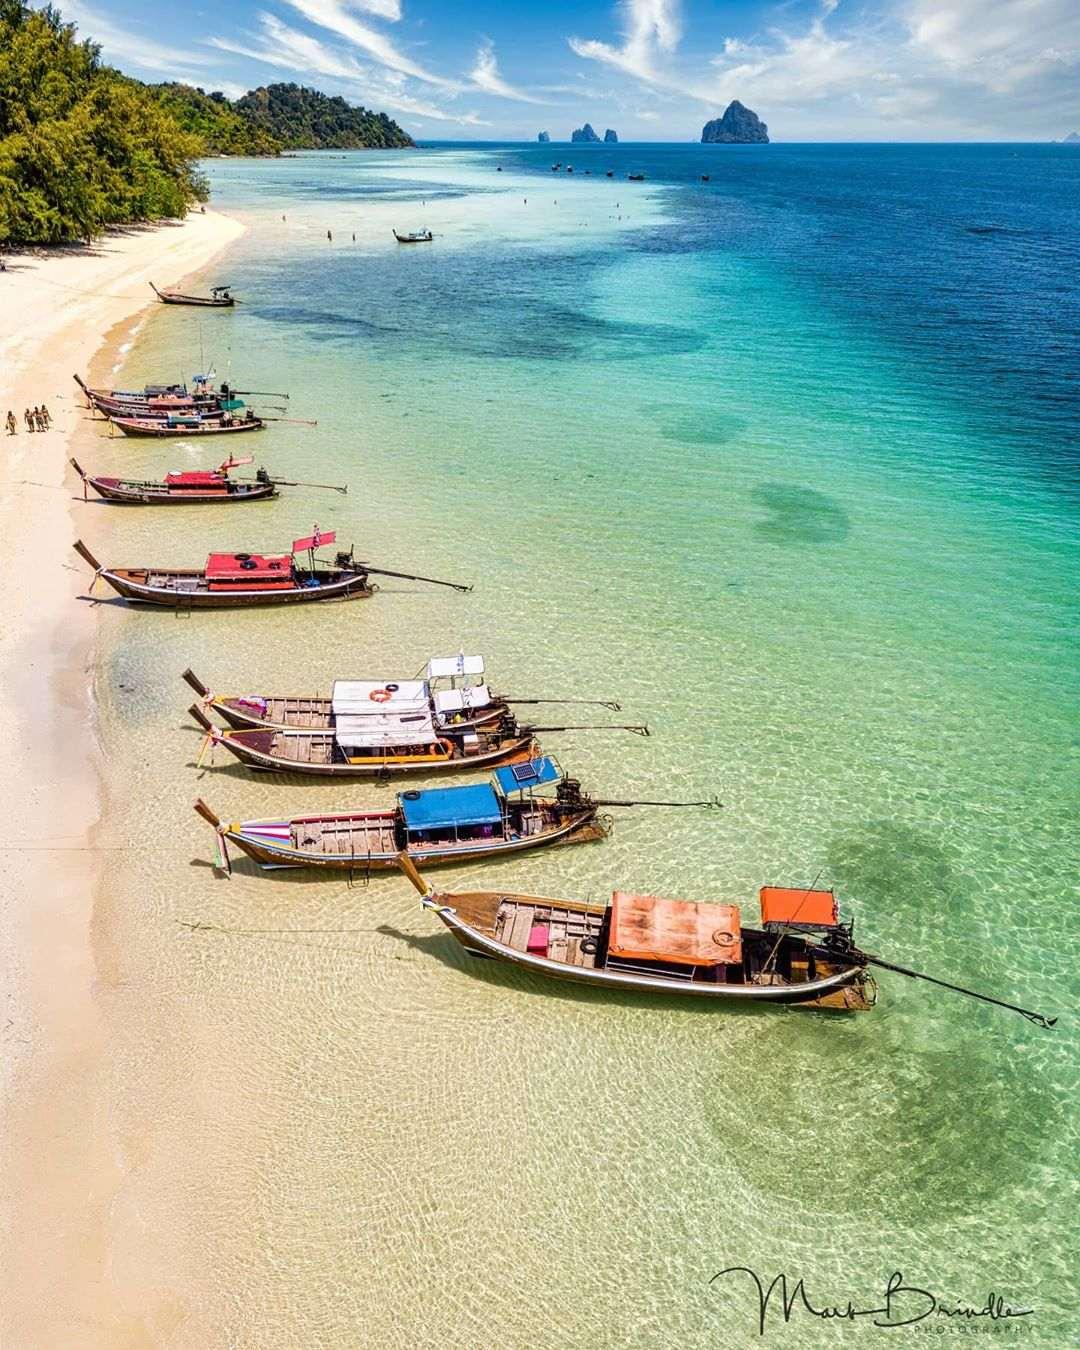 Longtail boats moored at the coast of Koh Kradan, Thailand